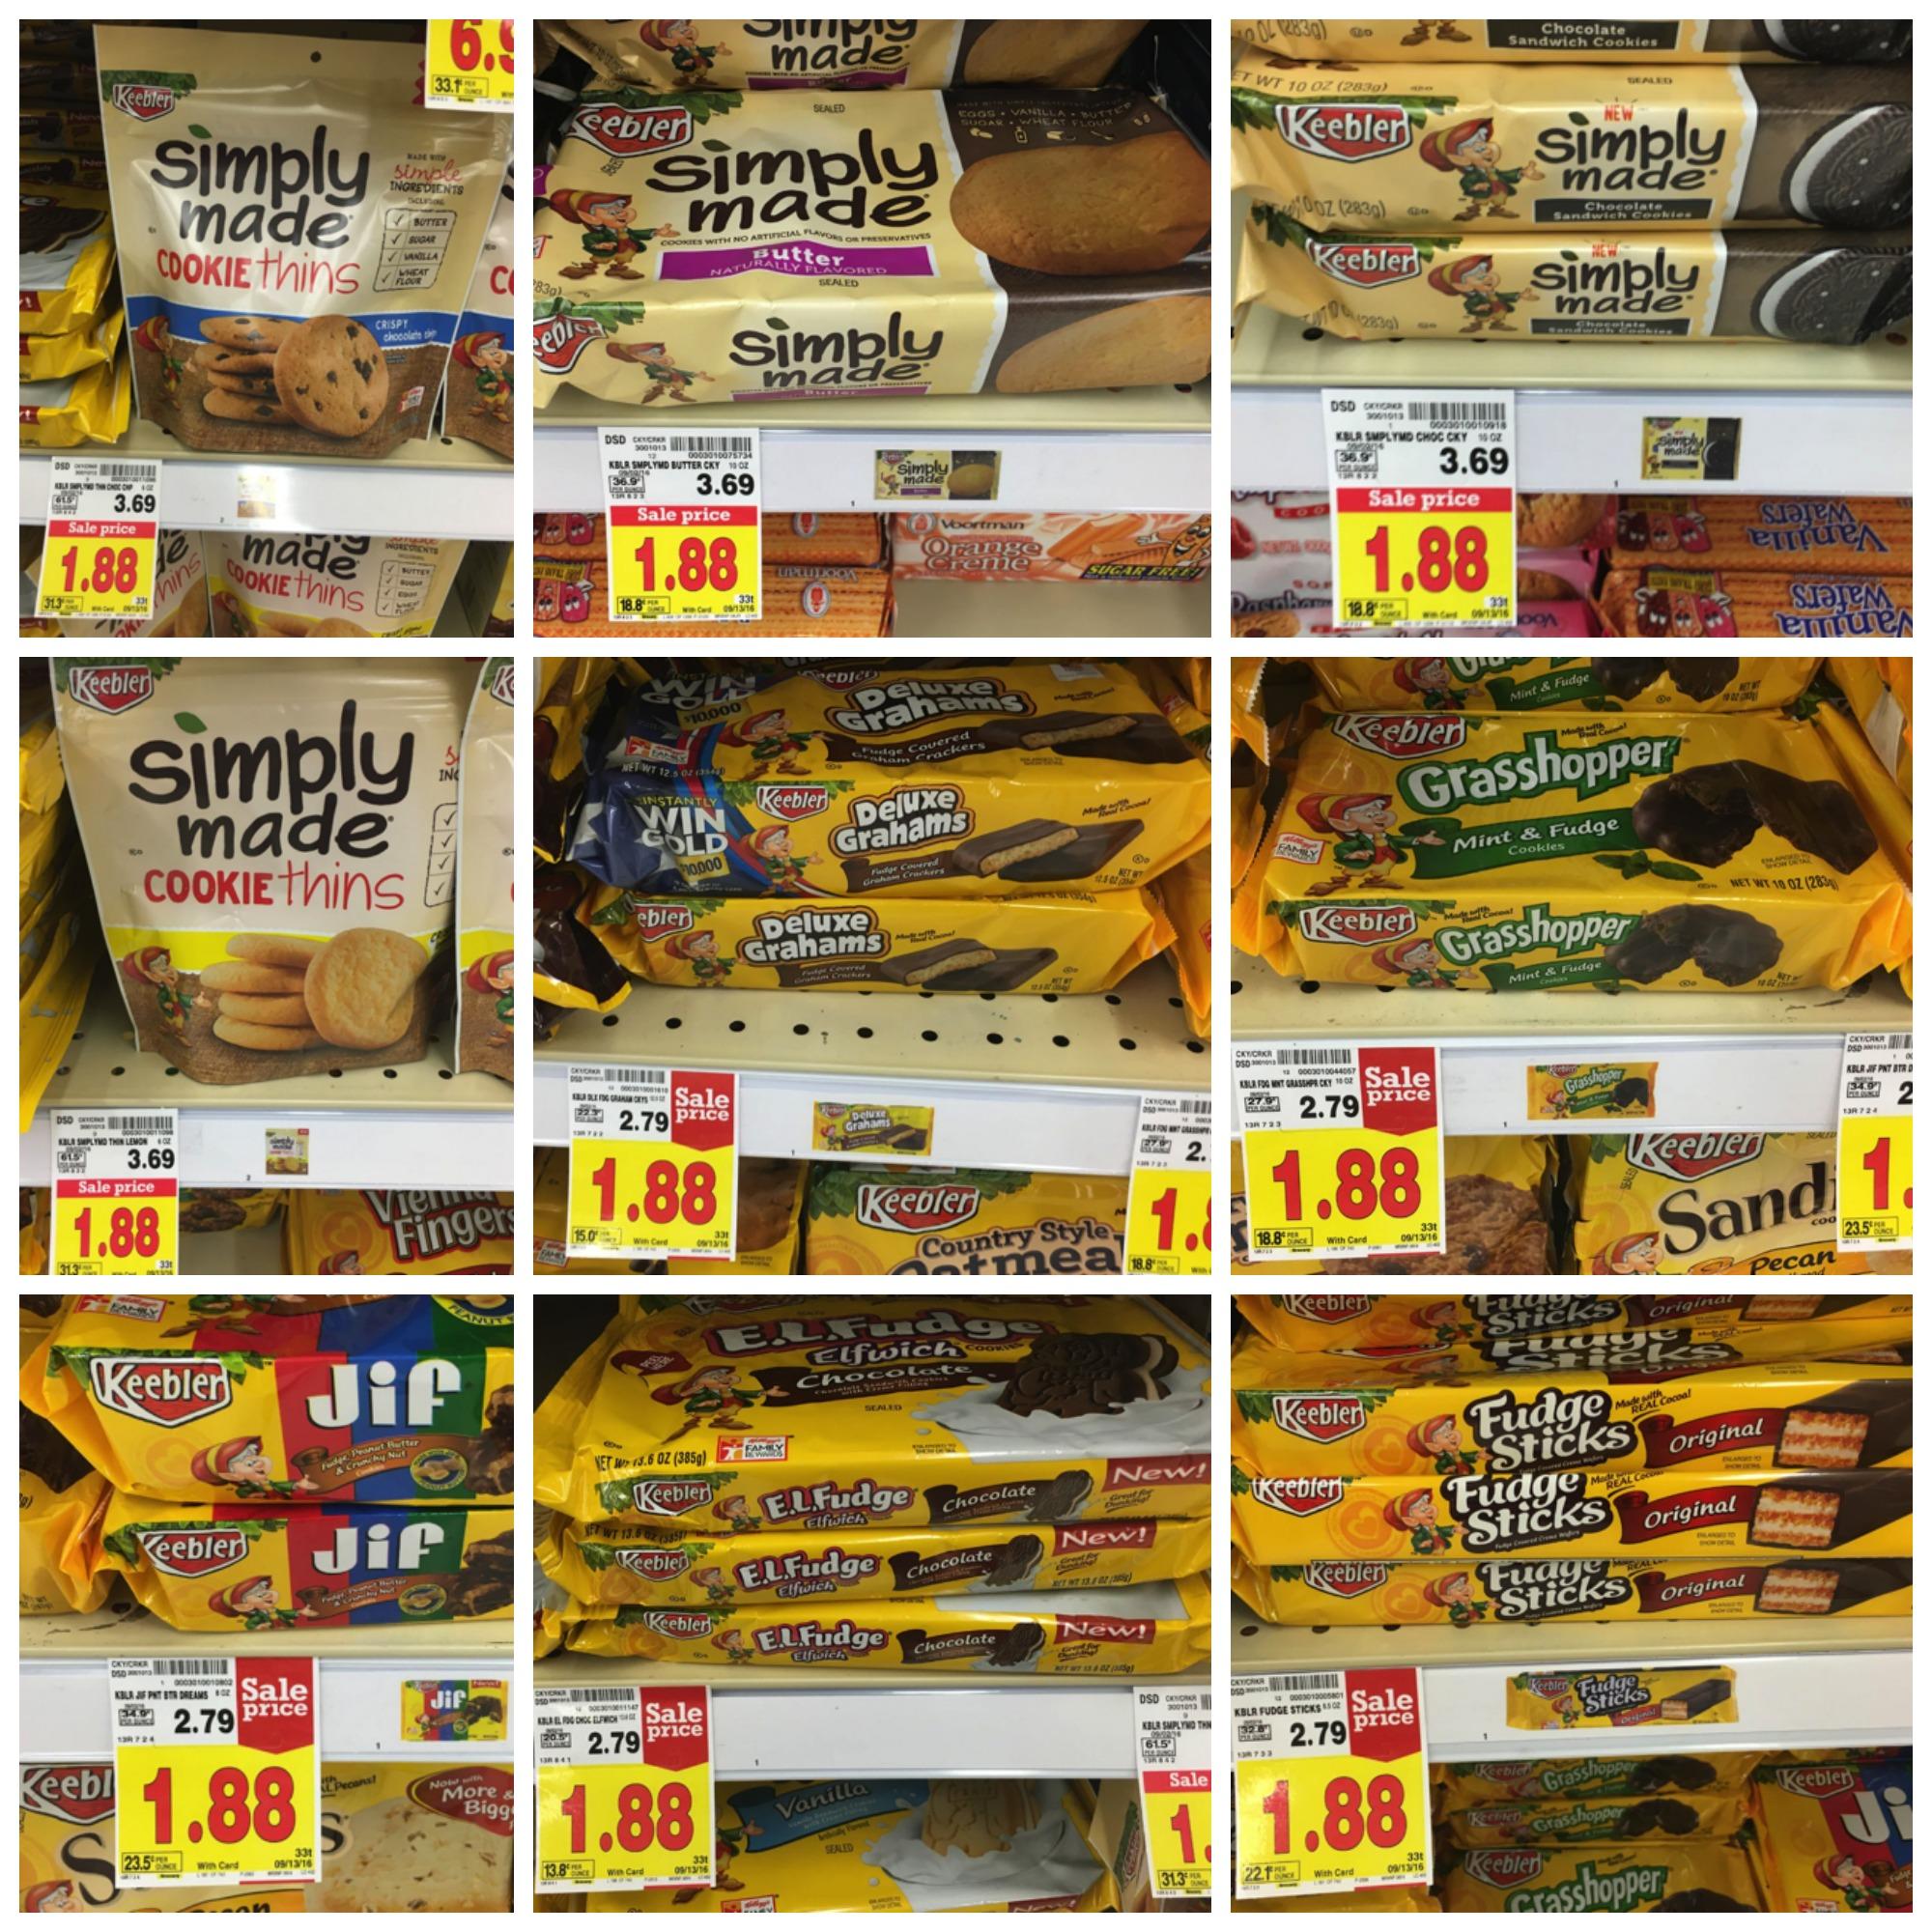 keebler cookies Collage